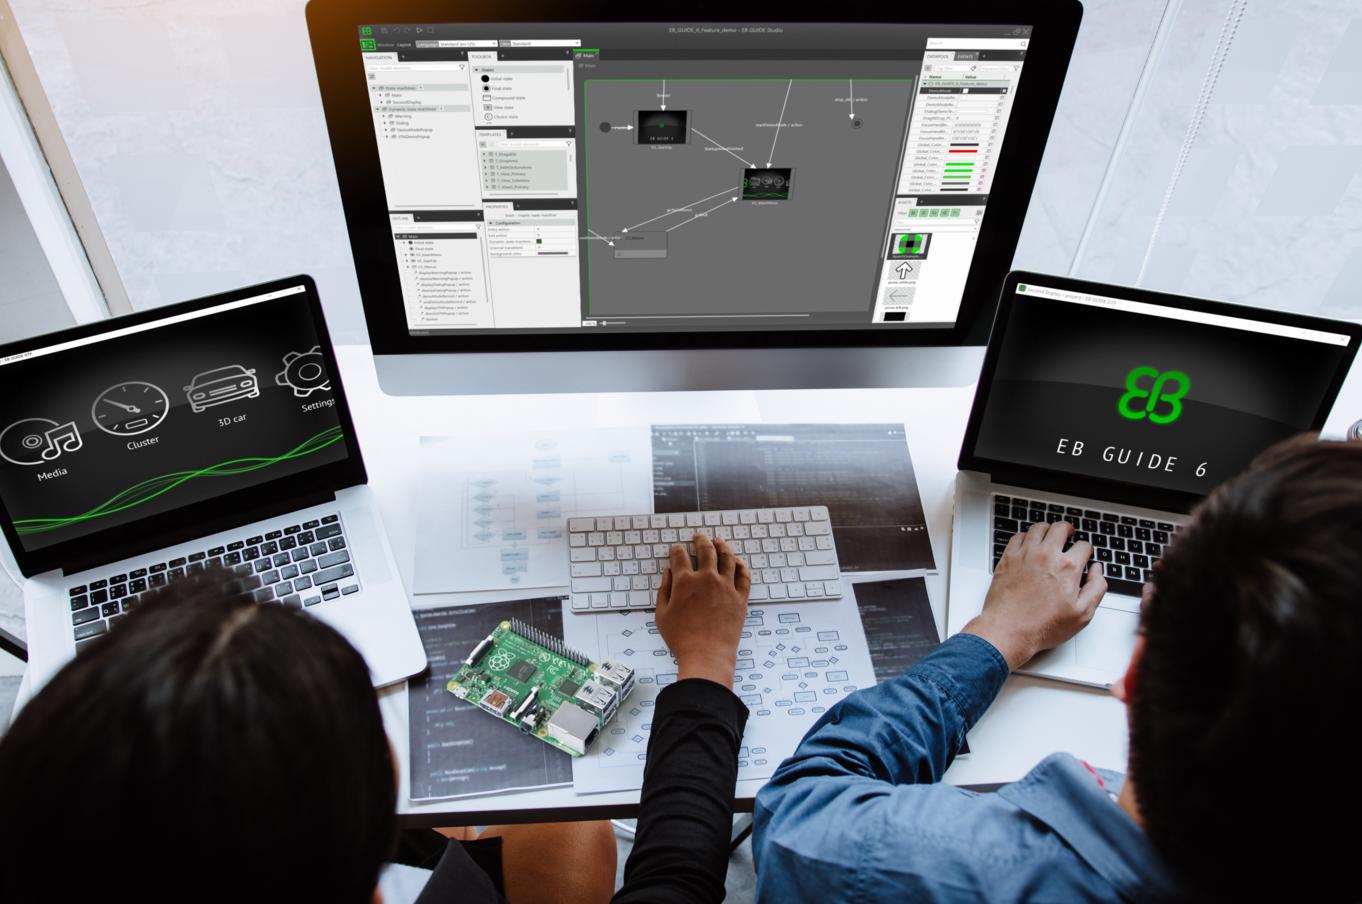 Elektrobit  EB GUIDE加速 Pioneer最新显示音频系统开发